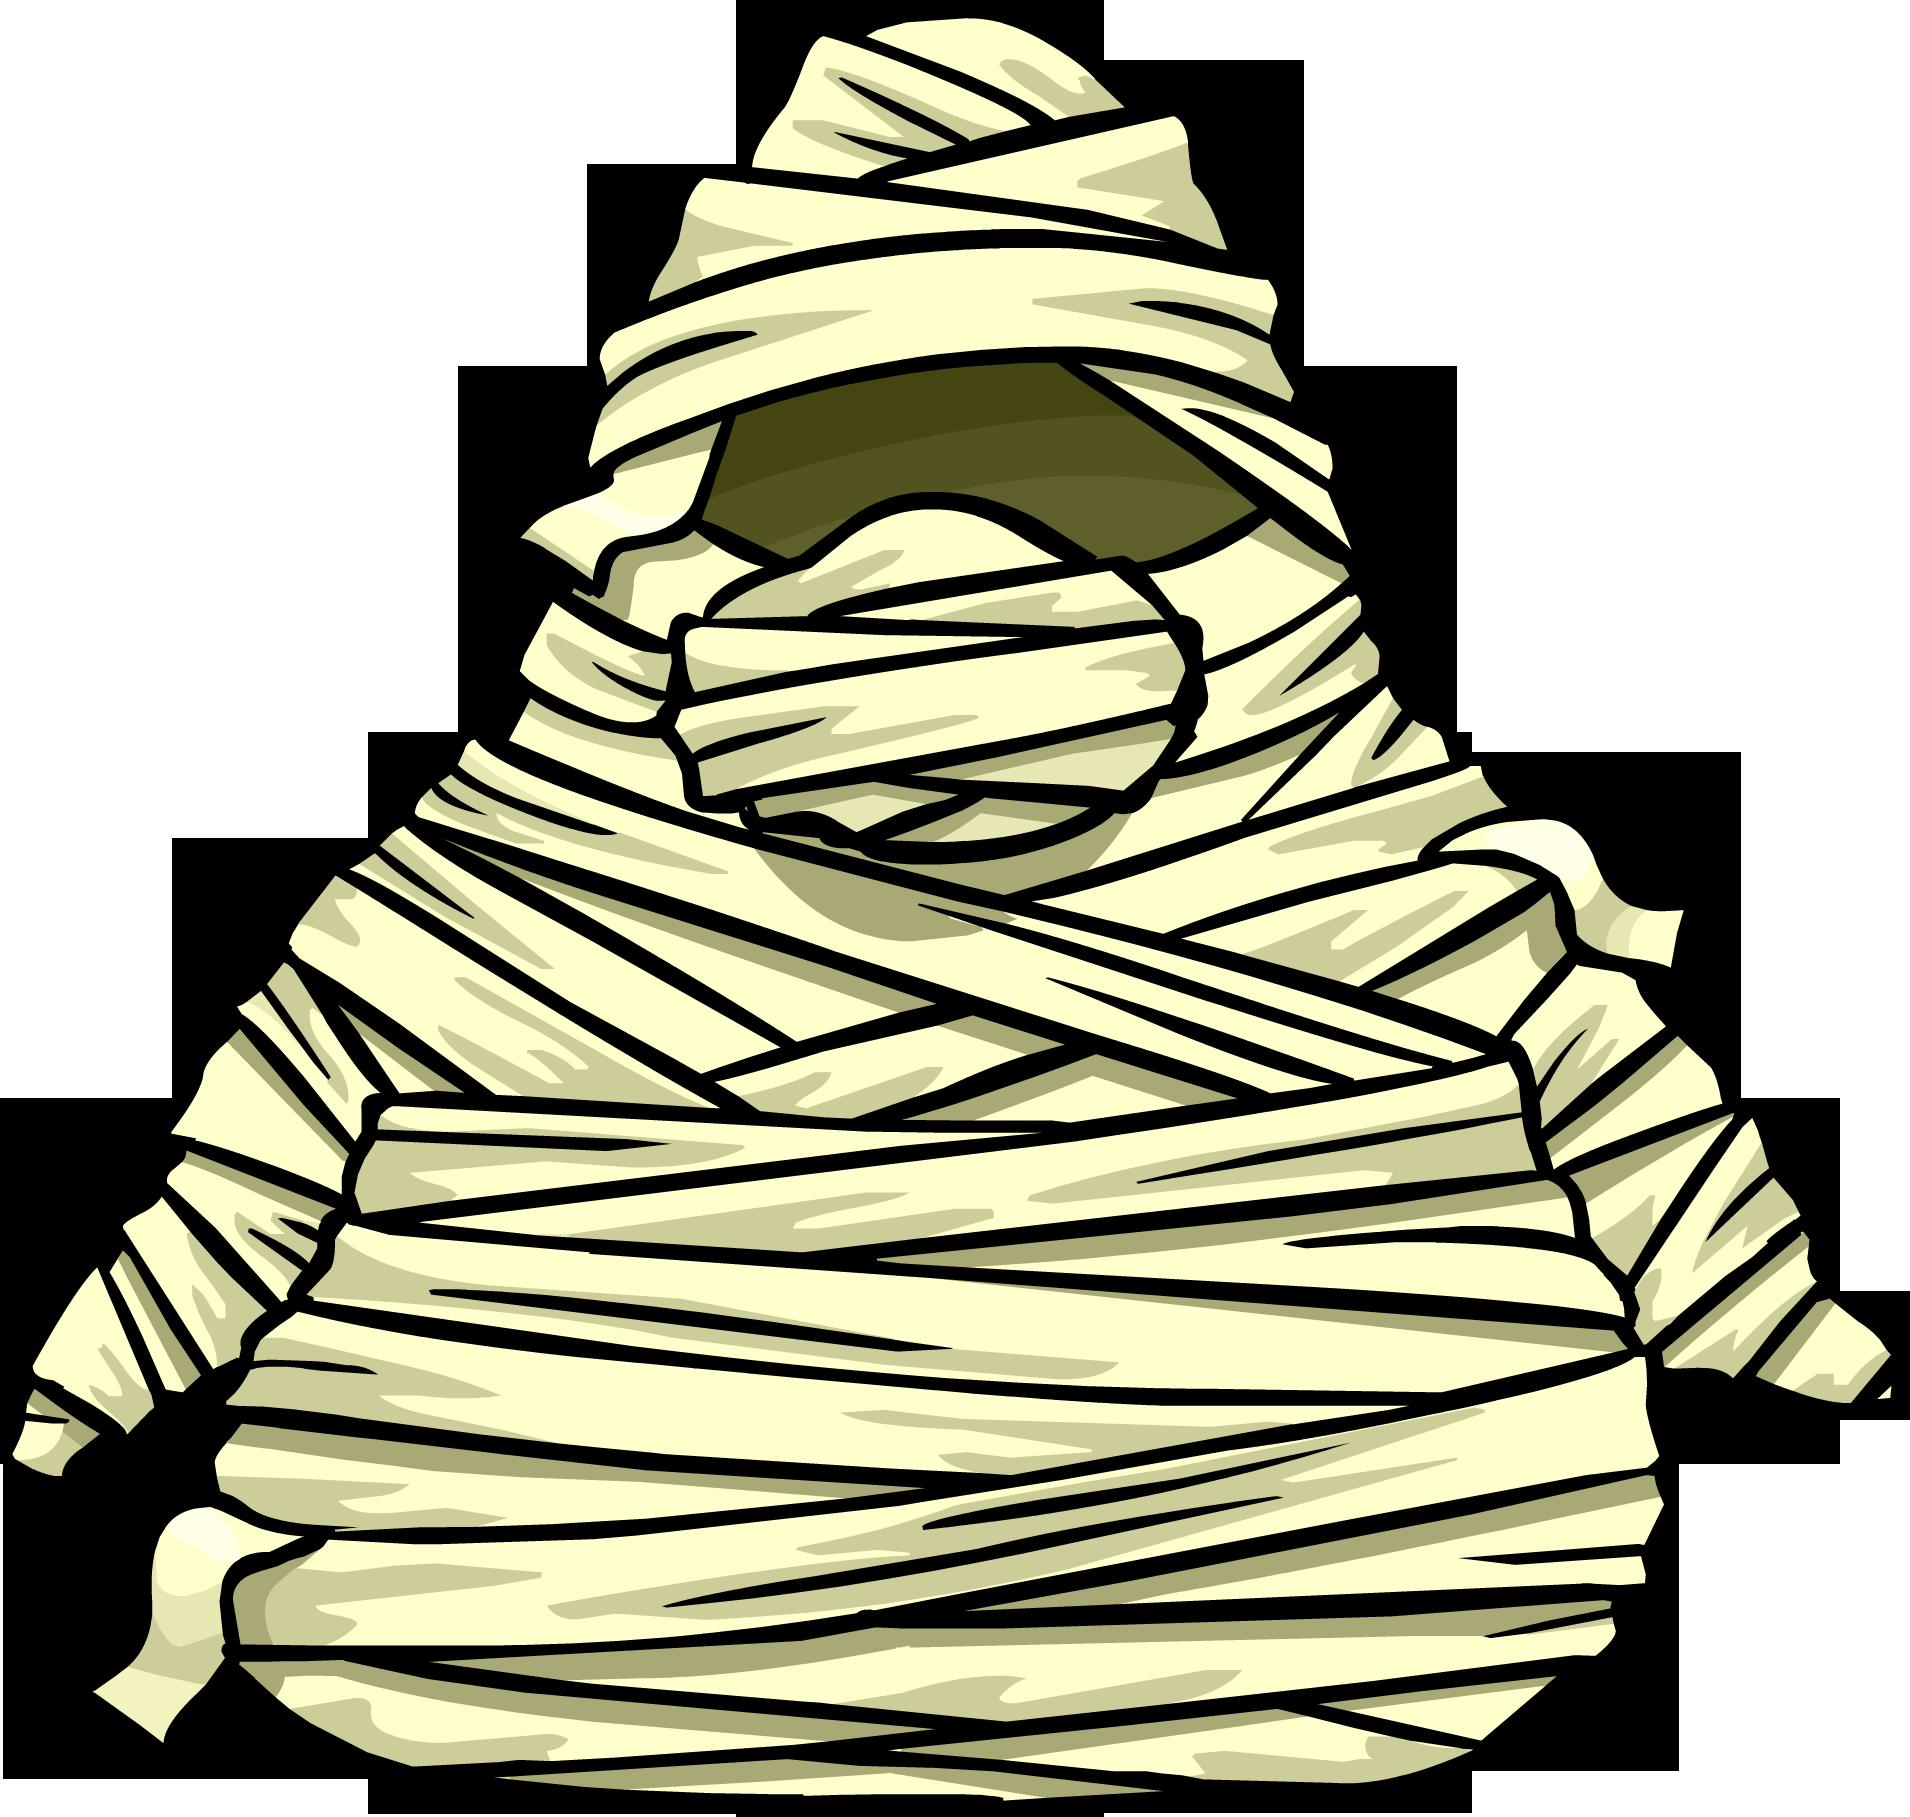 Halloween clipart mummy graphic free Halloween mummy pictures clipart image 3 - Clipartix graphic free